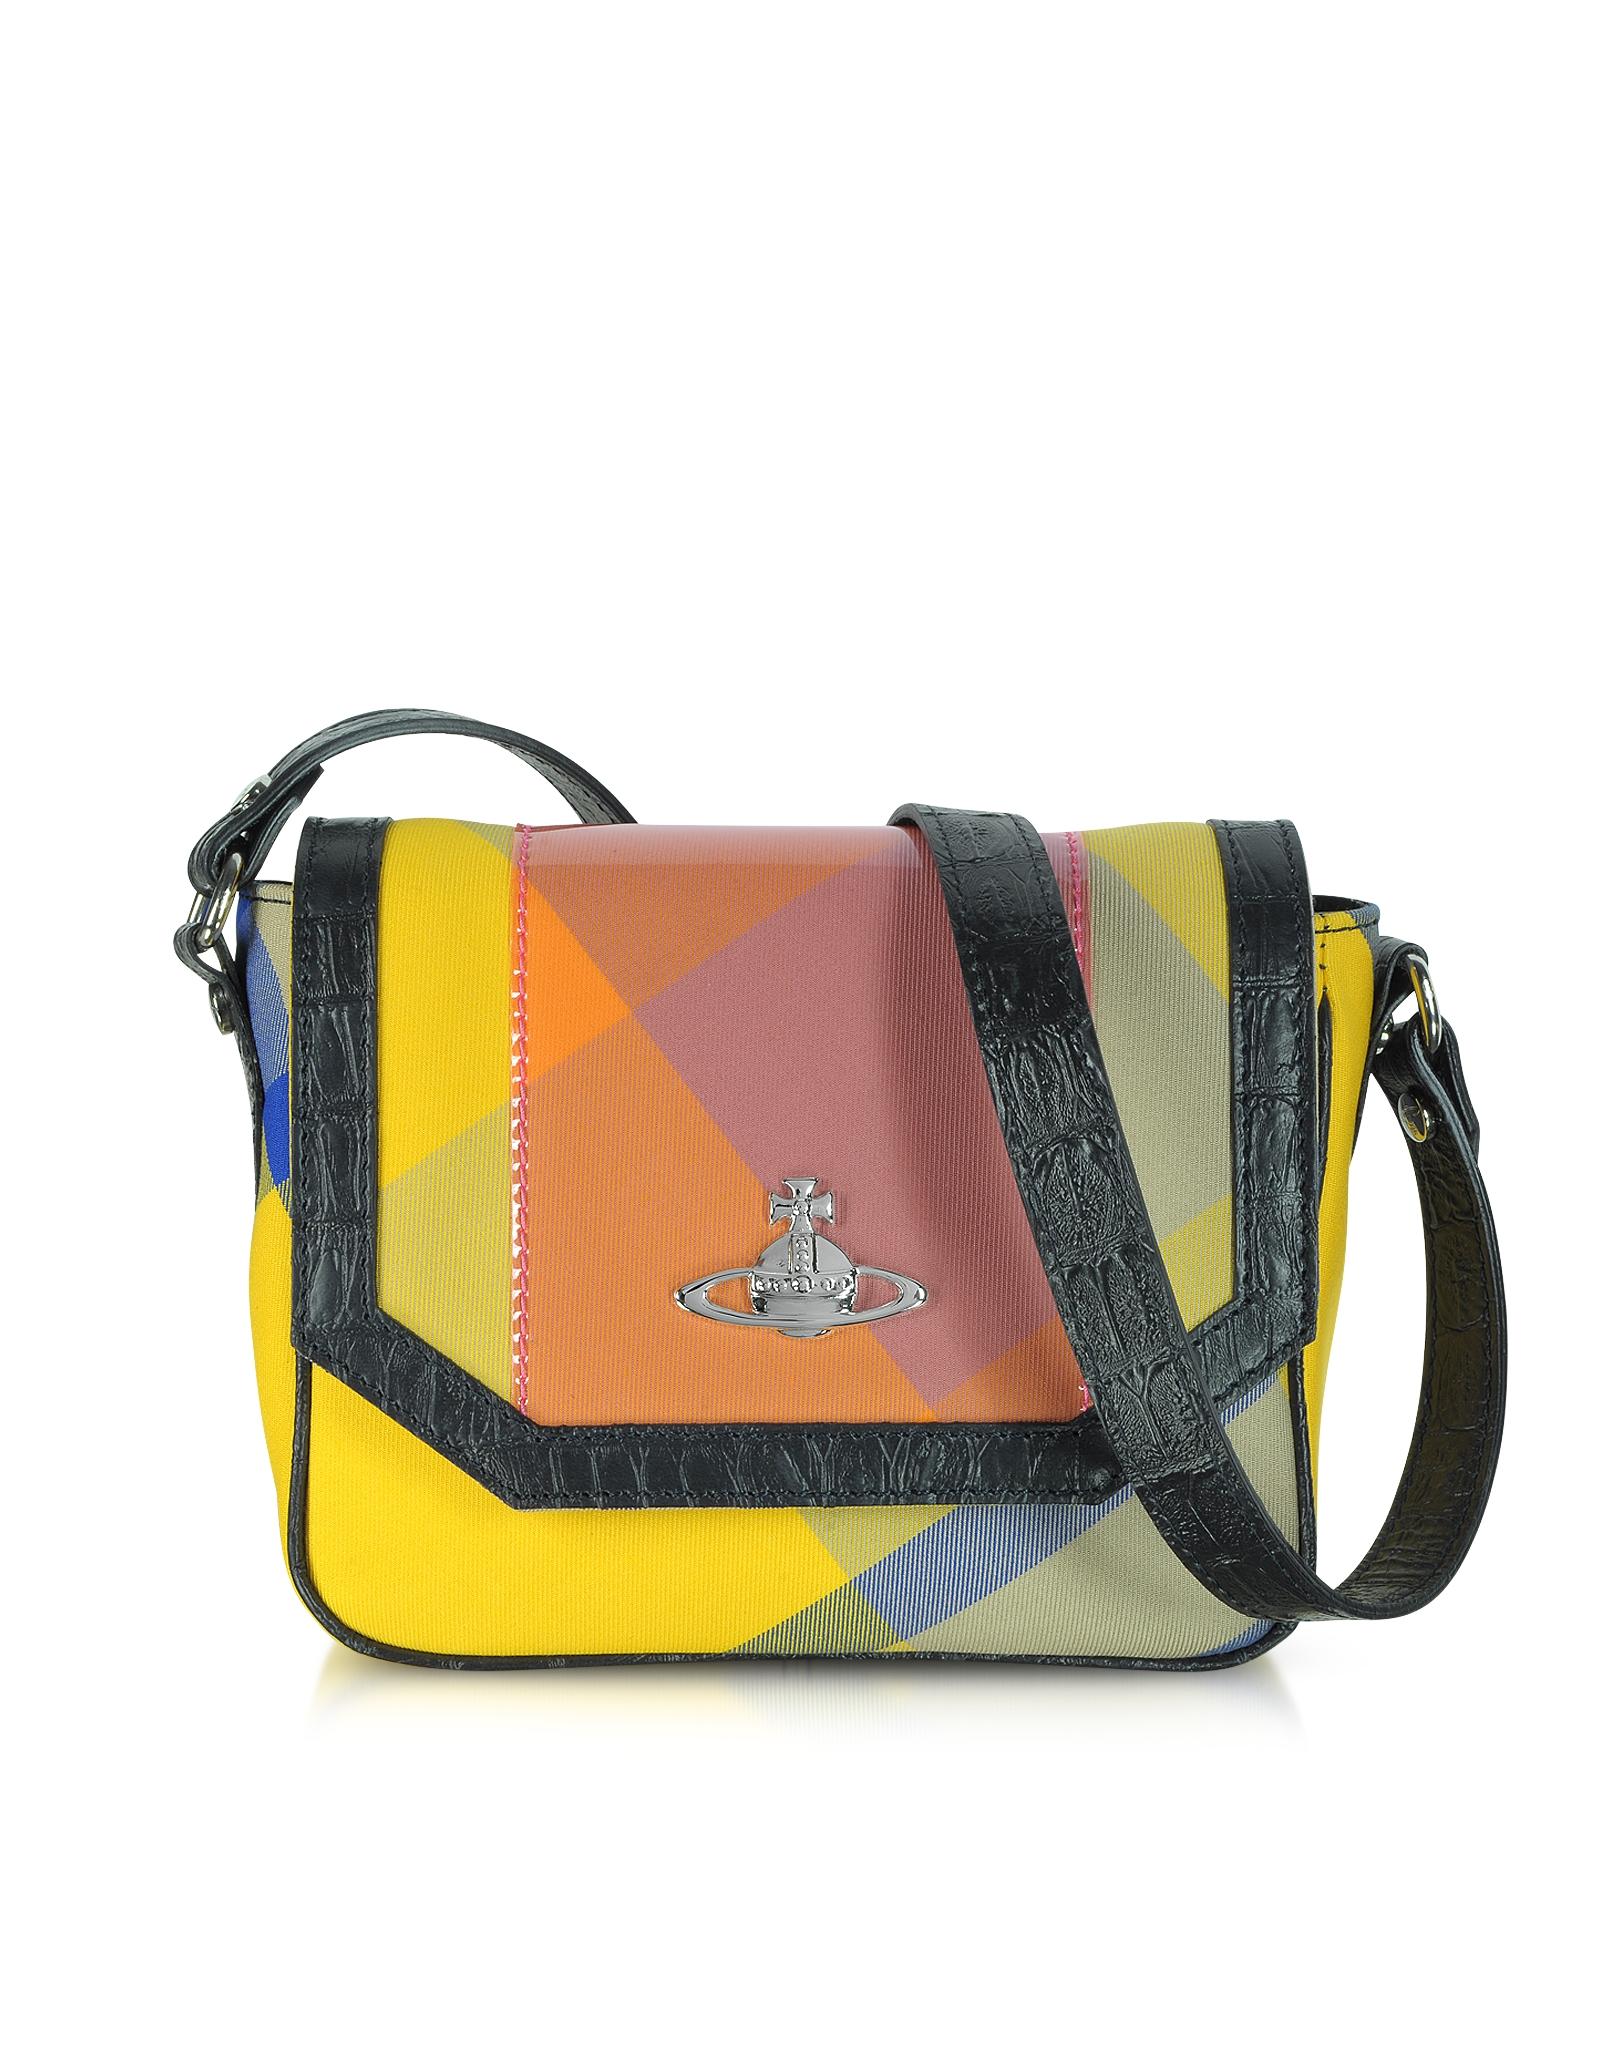 vivienne westwood tartan small crossbody bag in